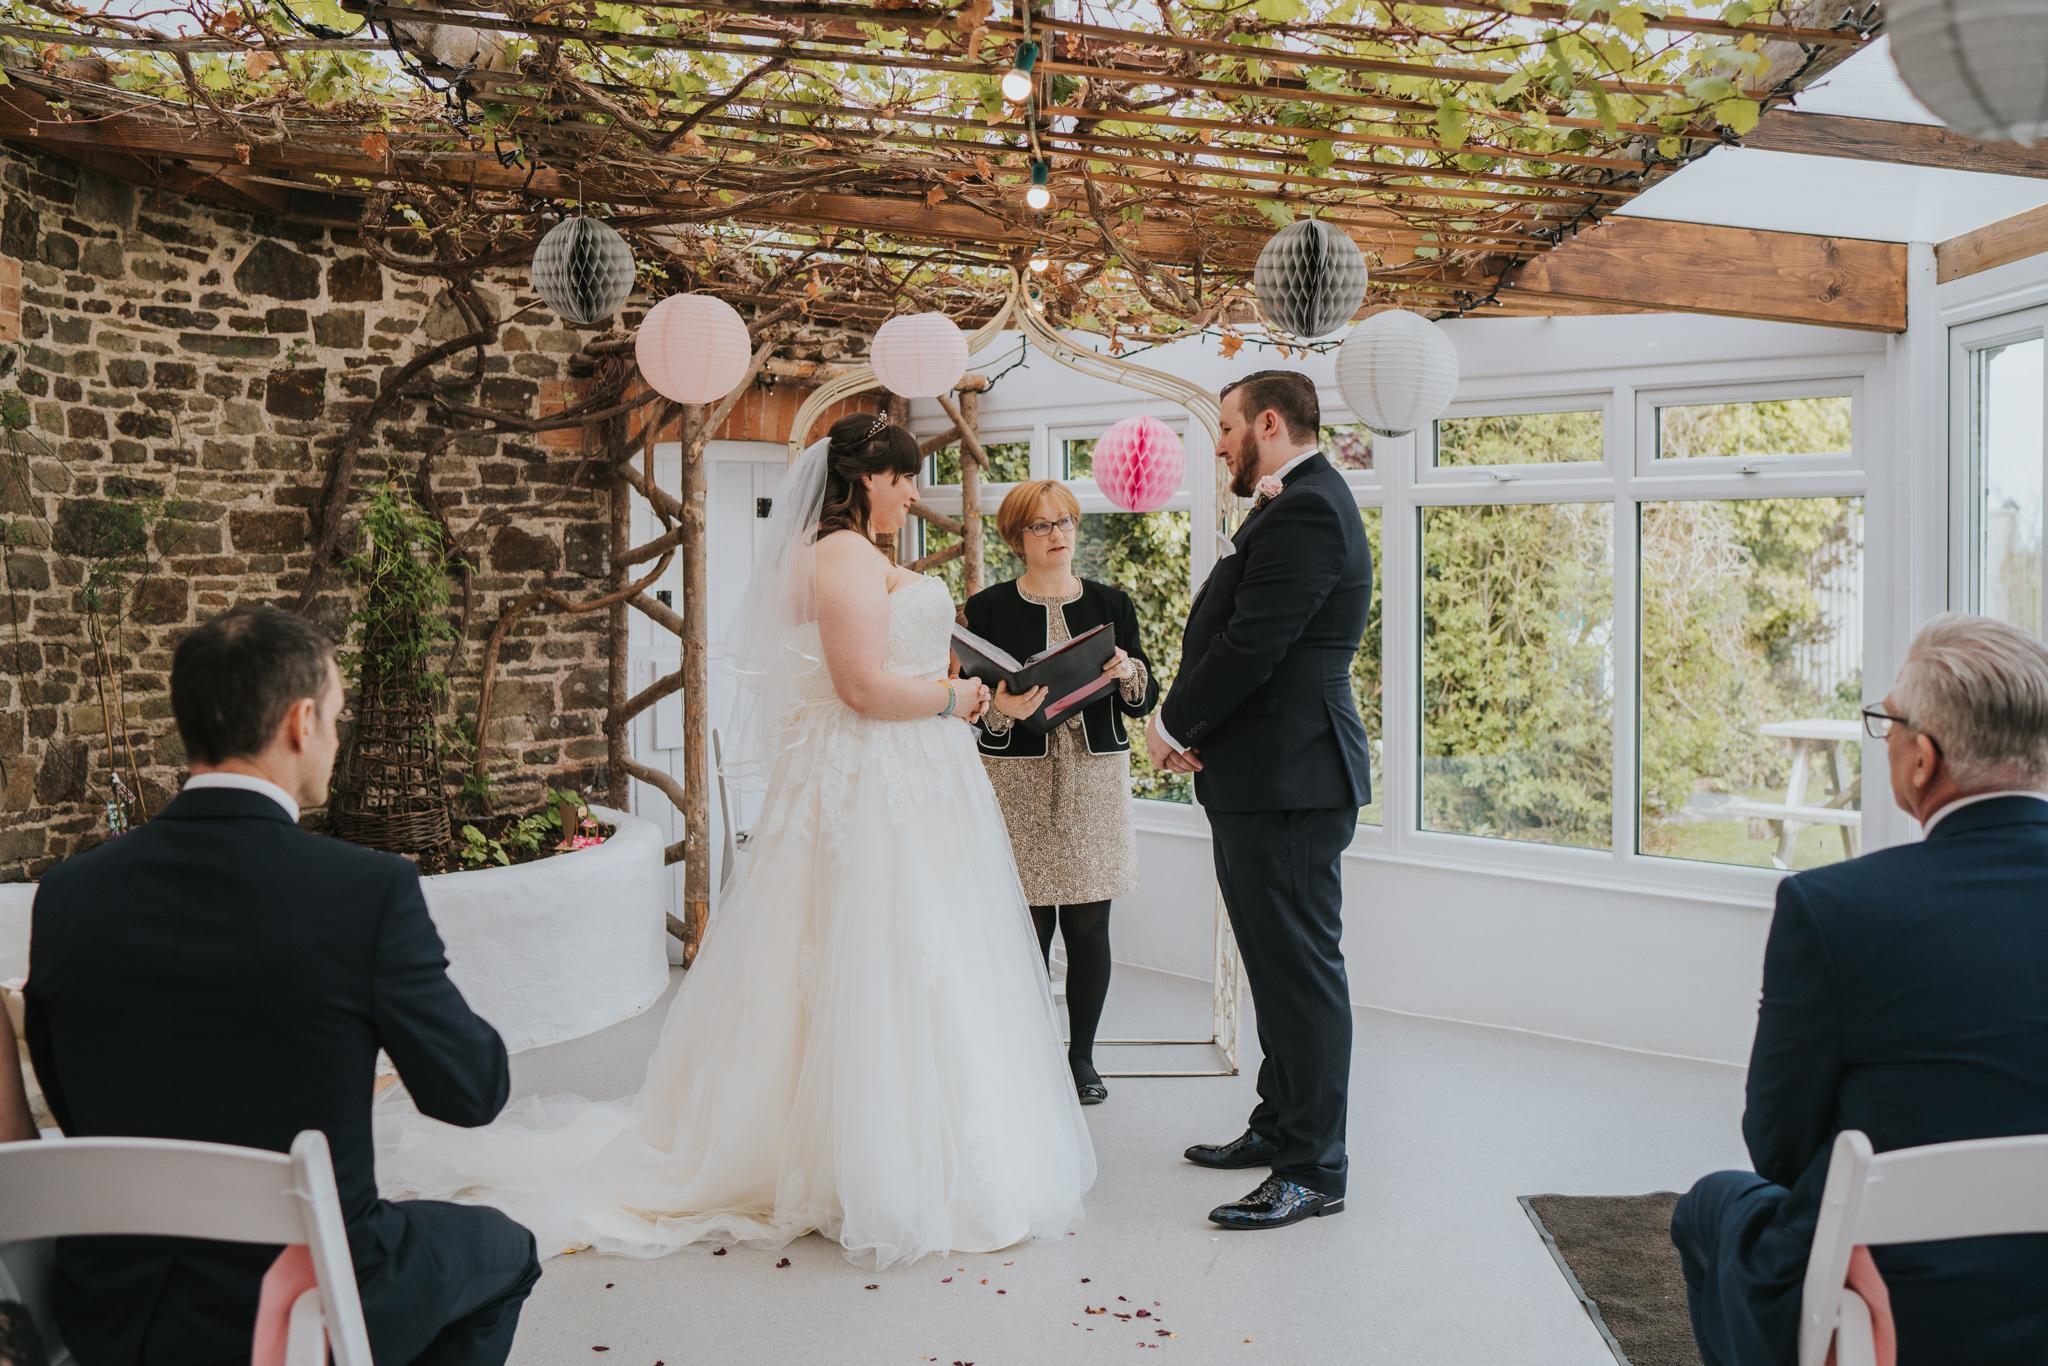 grace-sam-old-barn-clovelly-devon-wedding-photographer-grace-elizabeth-essex-suffolk-norfolk-wedding-photographer (51 of 132).jpg